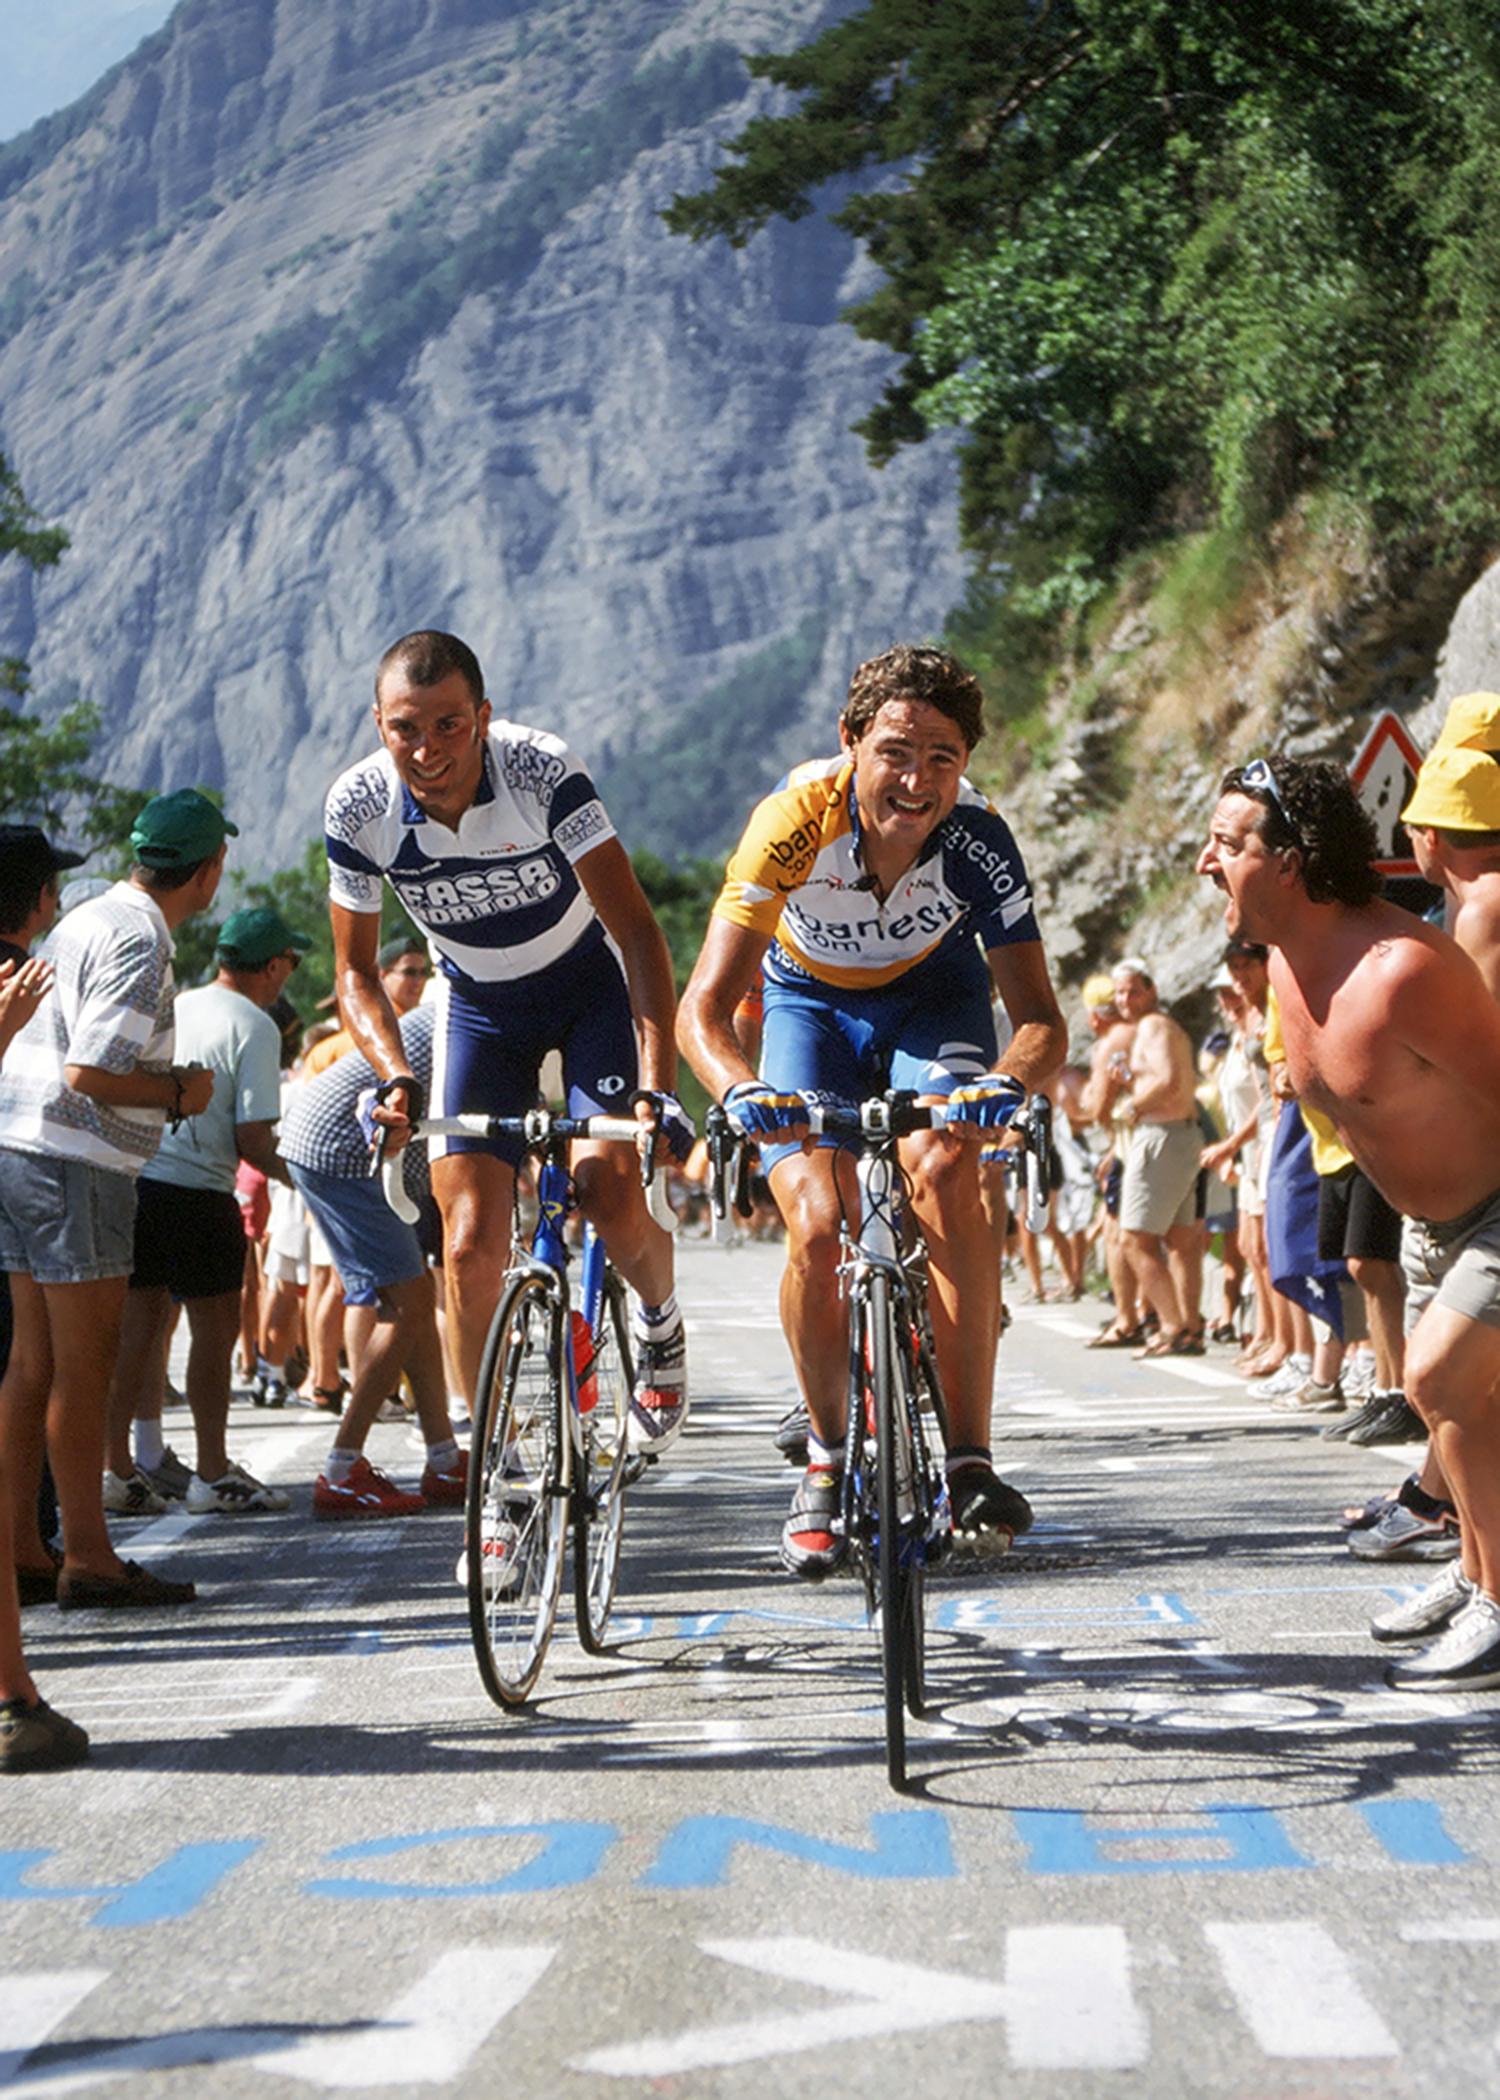 Ivan Basso & Francisco Mancebo climbing Alpe d'Huez at the Tour de France. Shot on film.